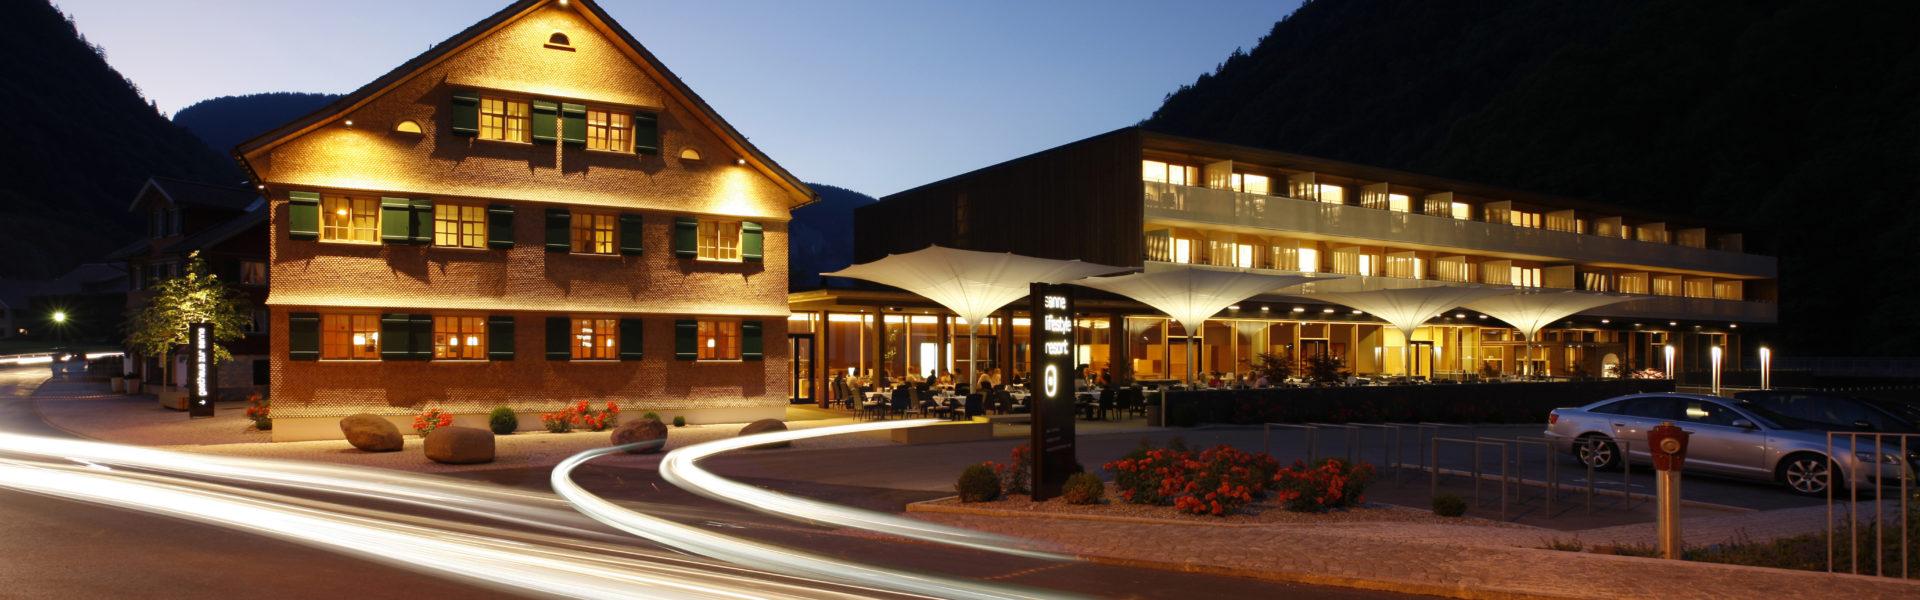 Sonne Lifestyle Resort, Mellau